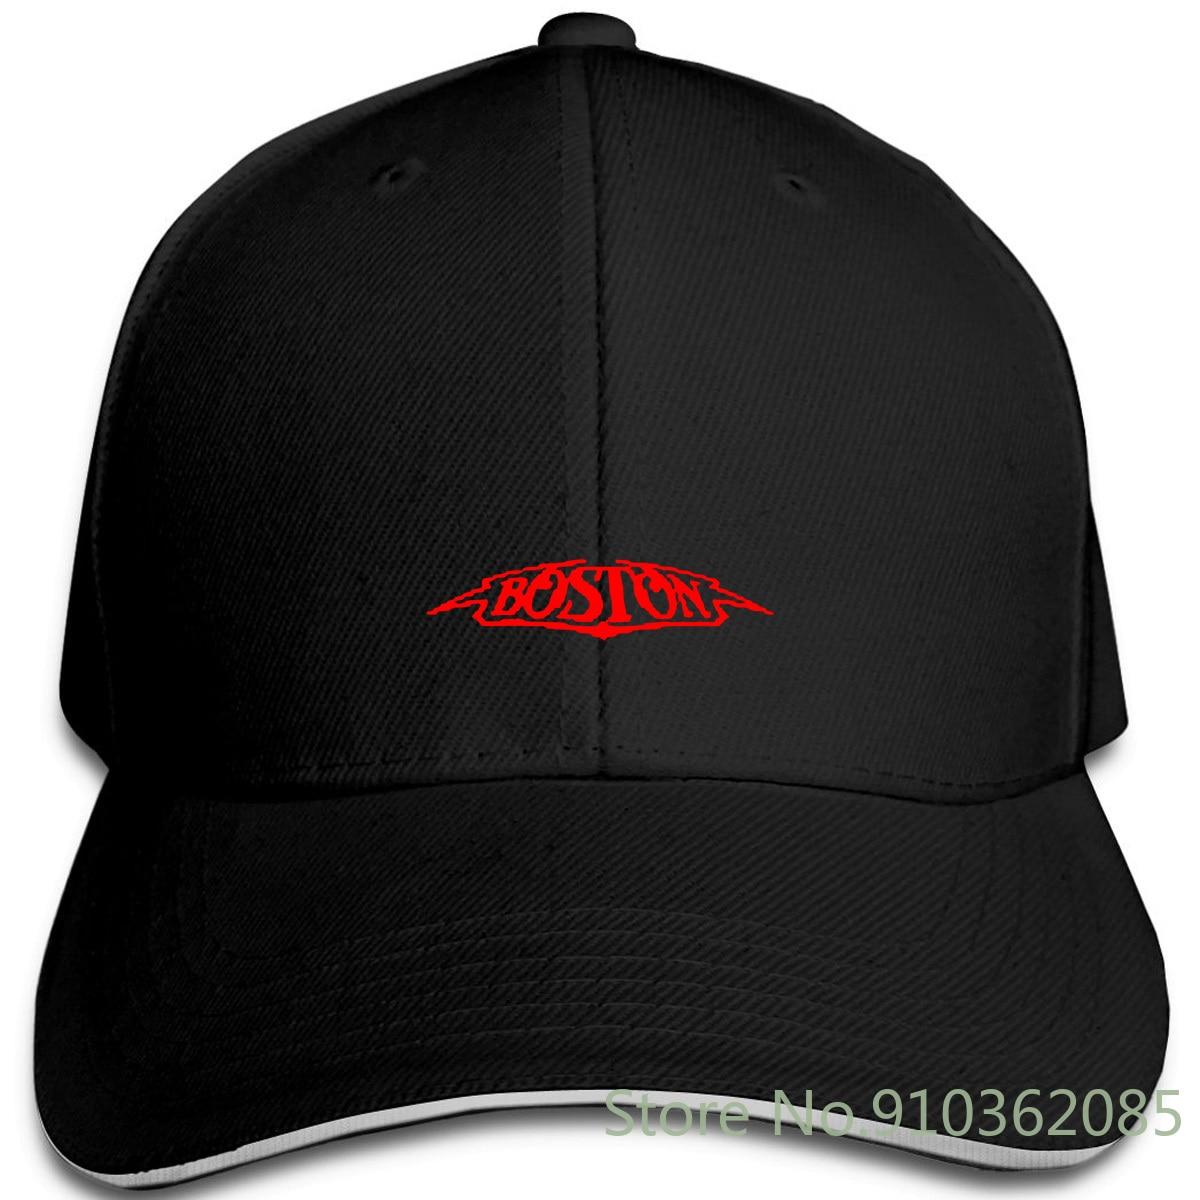 Nova boston rock band logotipo preto para barato por atacado harajuku bonés ajustáveis boné de beisebol masculino feminino